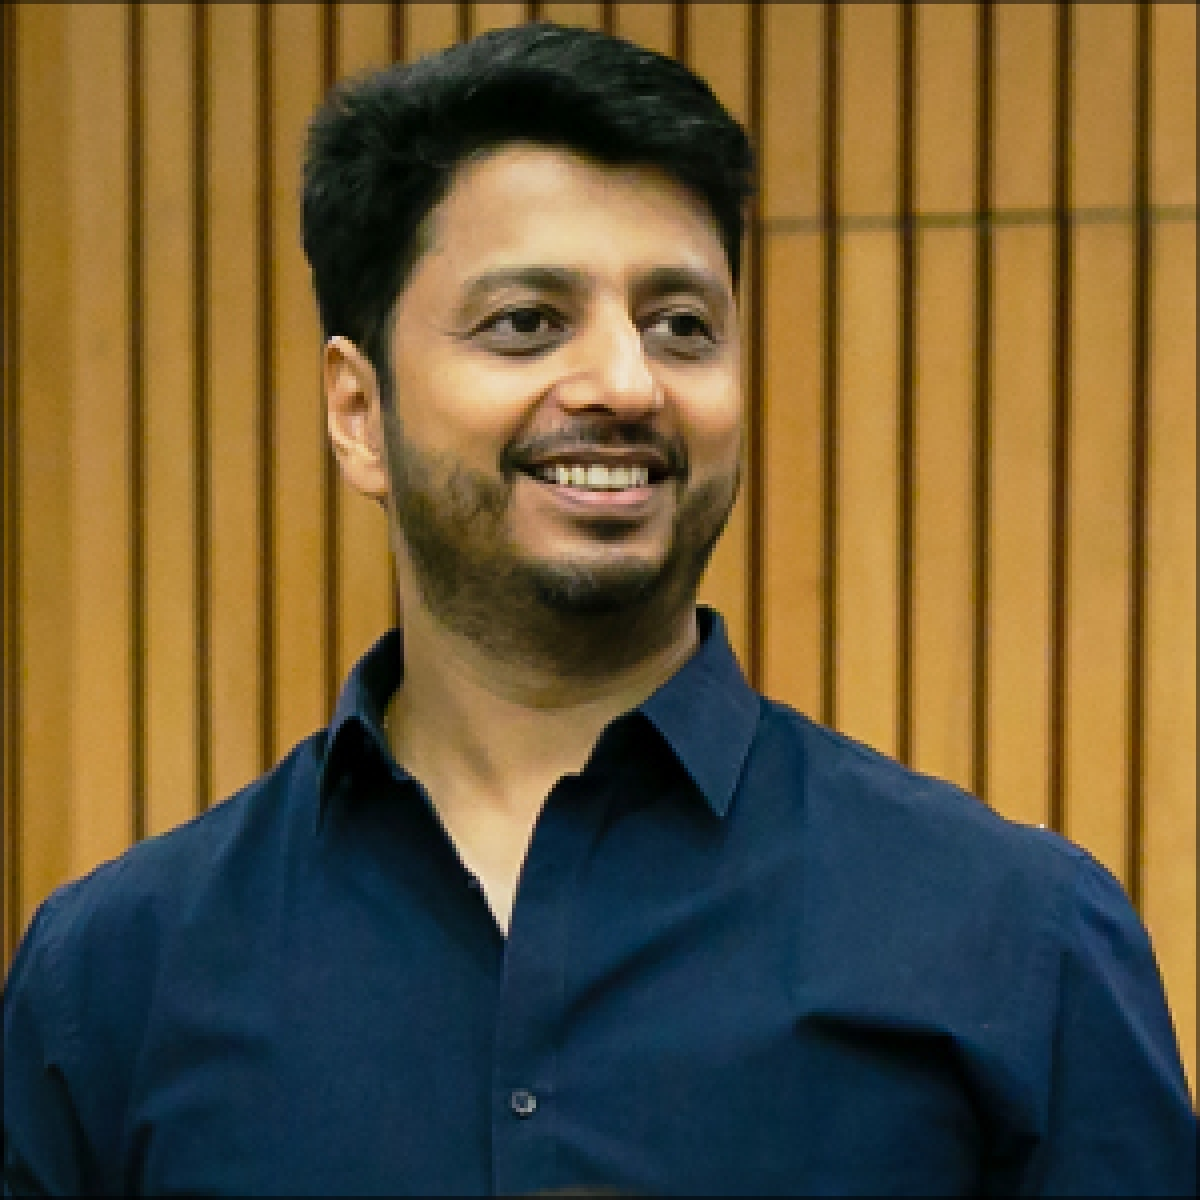 McCann Worldgroup appoints Ashish Chakravarty as executive director and head of creative